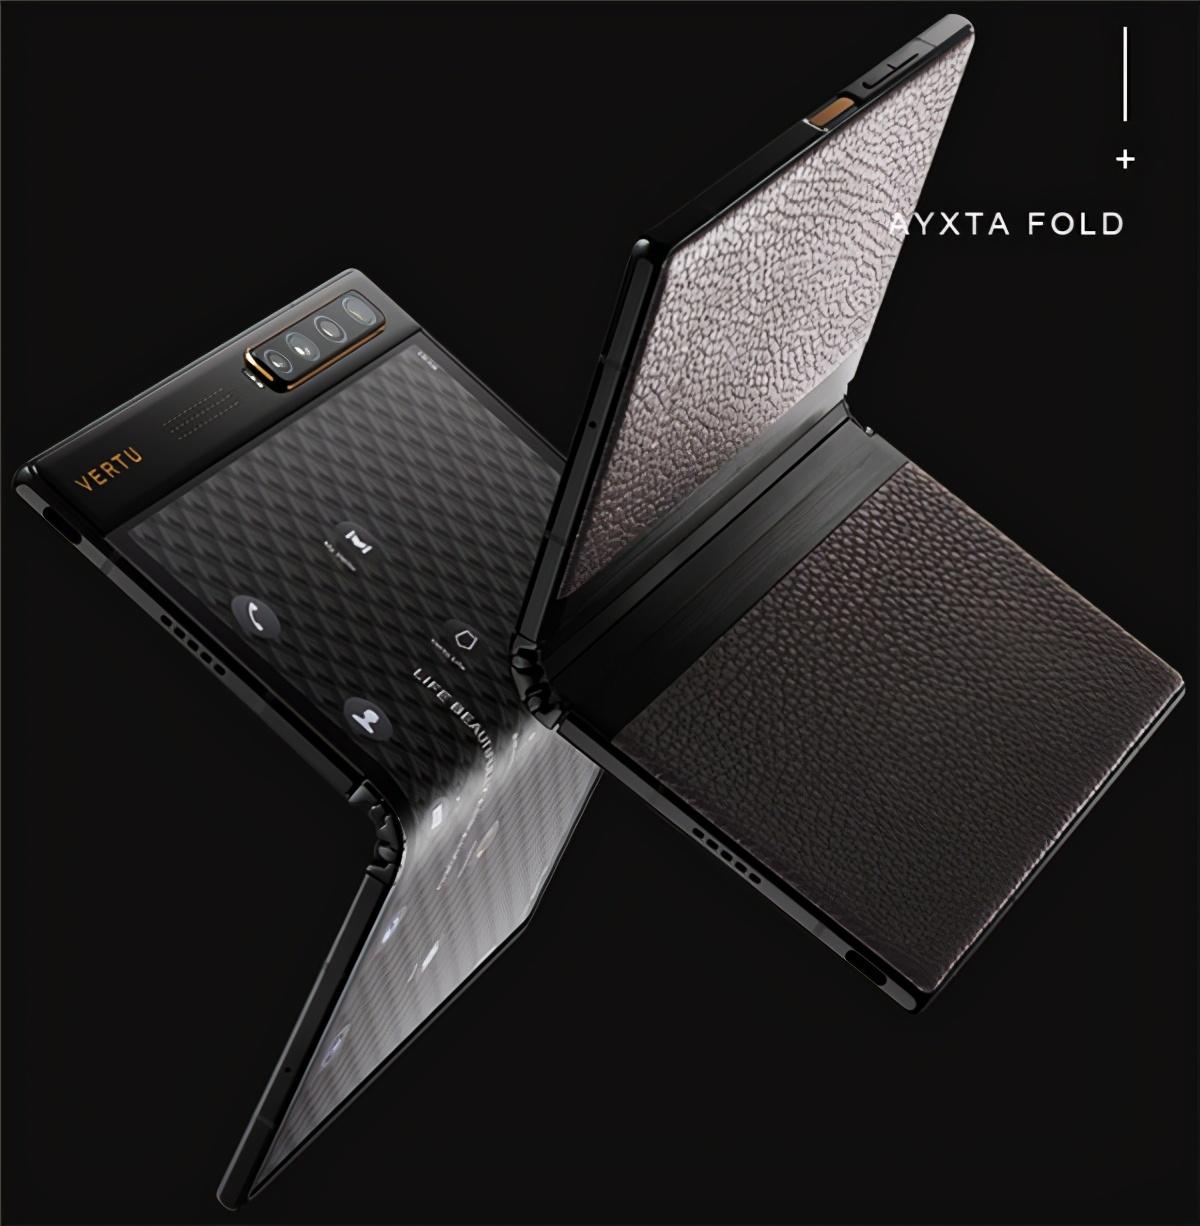 Vertu首款折叠屏手机来了!网友:华为Mate X2不贵了